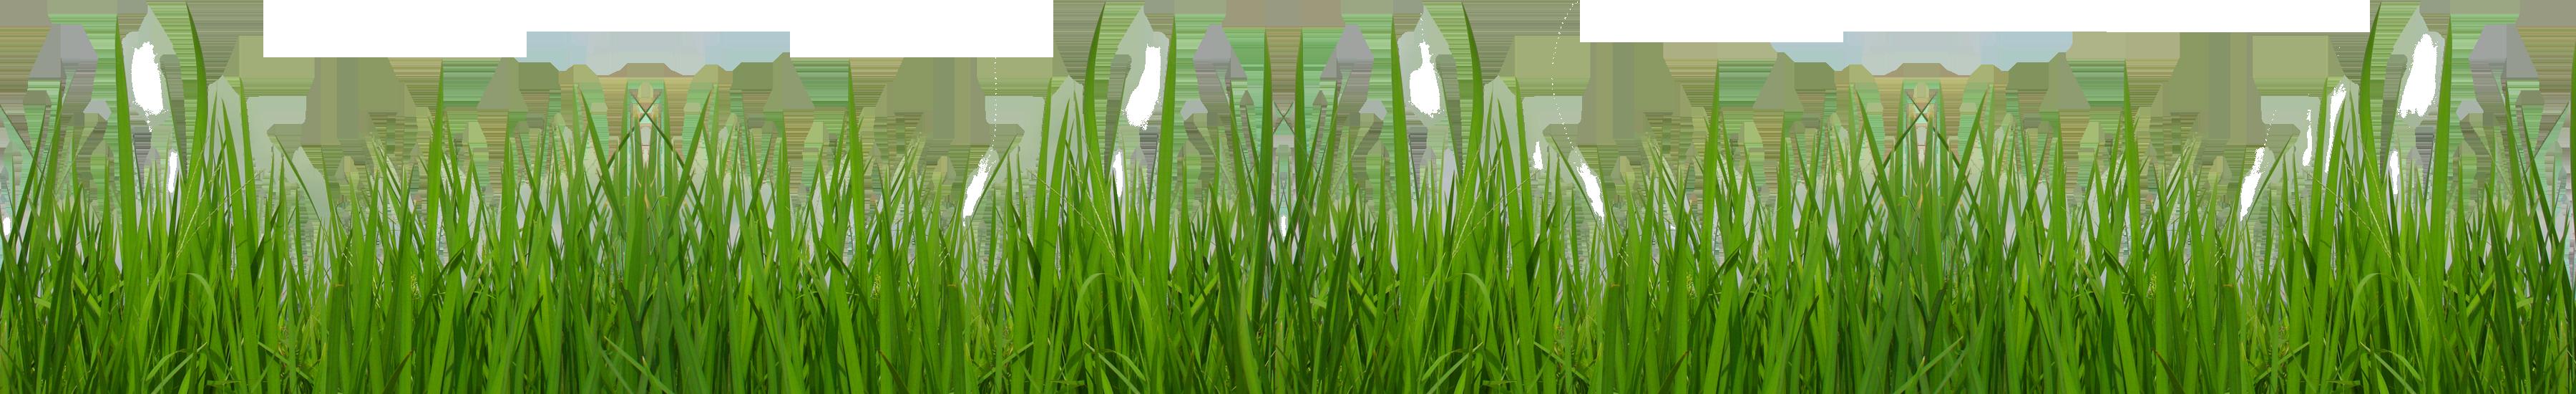 Grass graphic clipart graphic transparent download Grass Clipart graphic transparent download